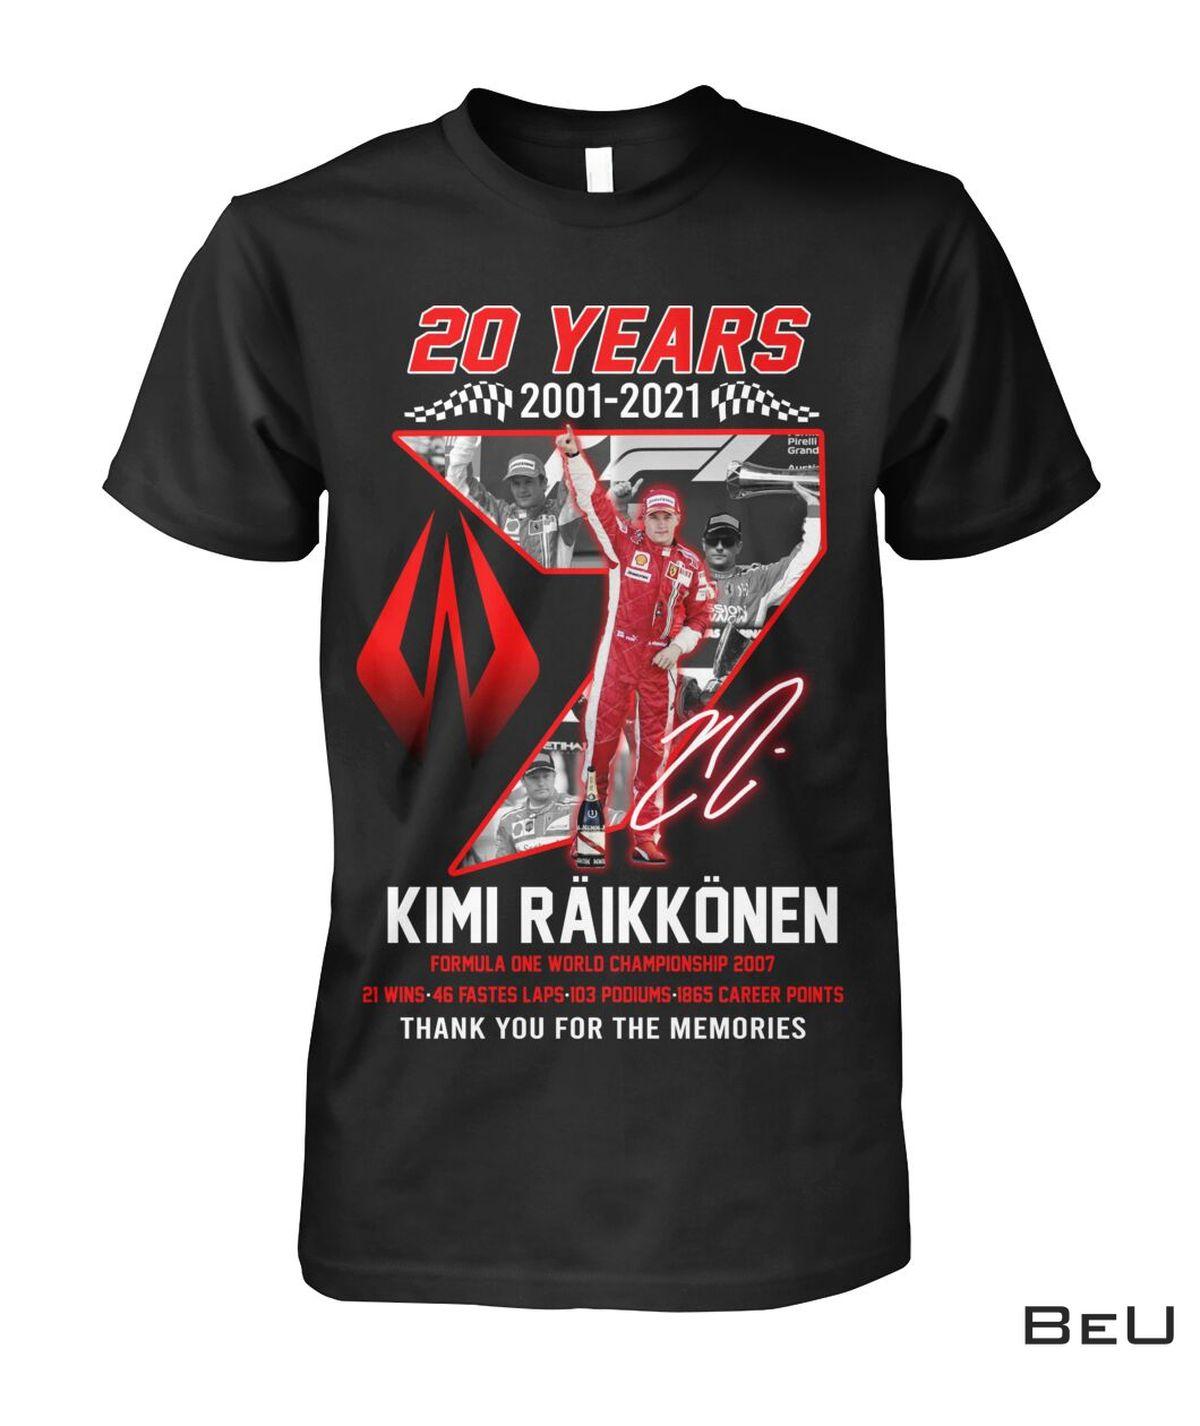 Kimi Raikkonen 20 Years Formula 1 World Championship 2007 Shirt, hoodie, tank top